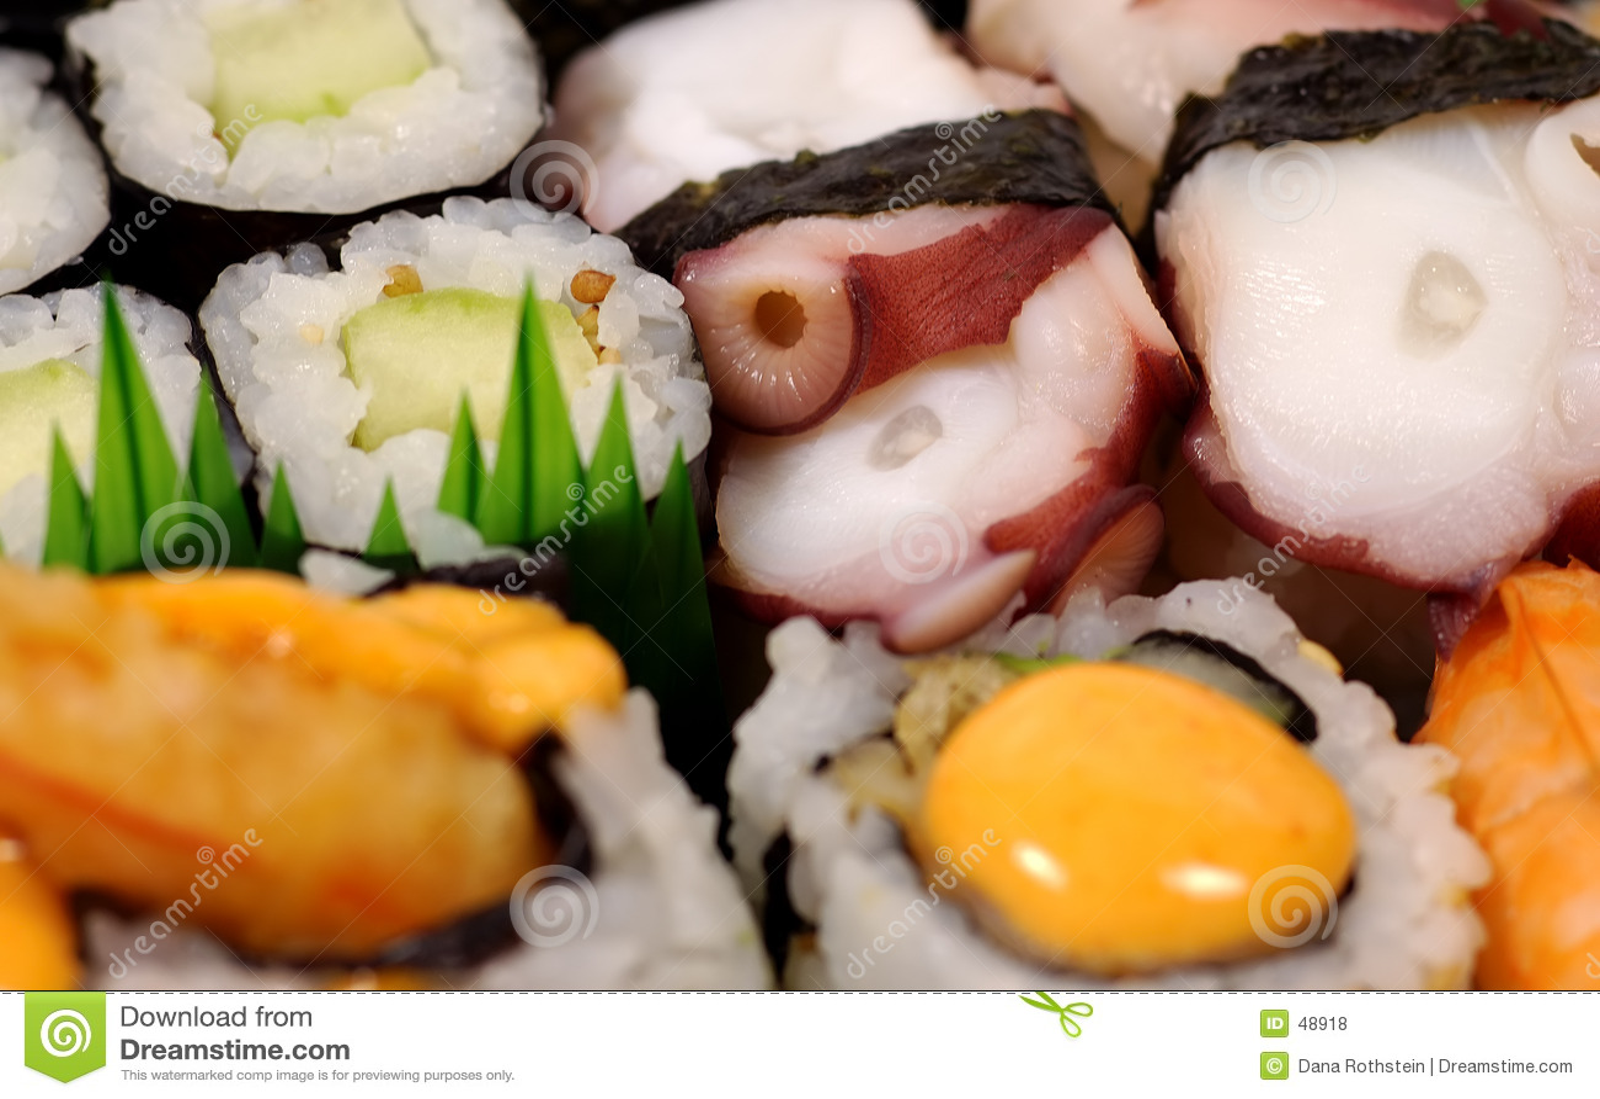 Półmiska sushi